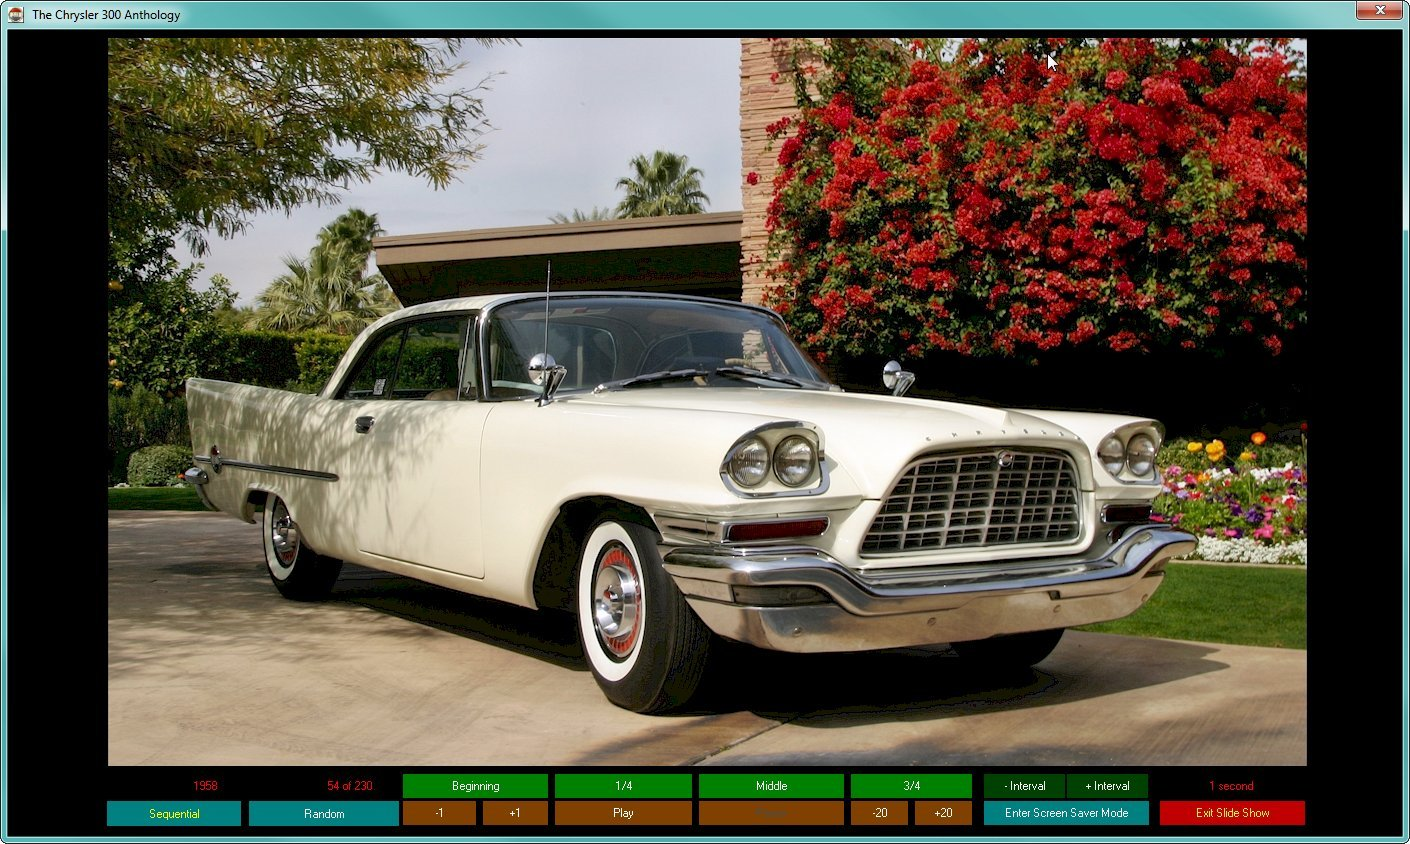 Chrysler 300 Anthology digital encyclopedia